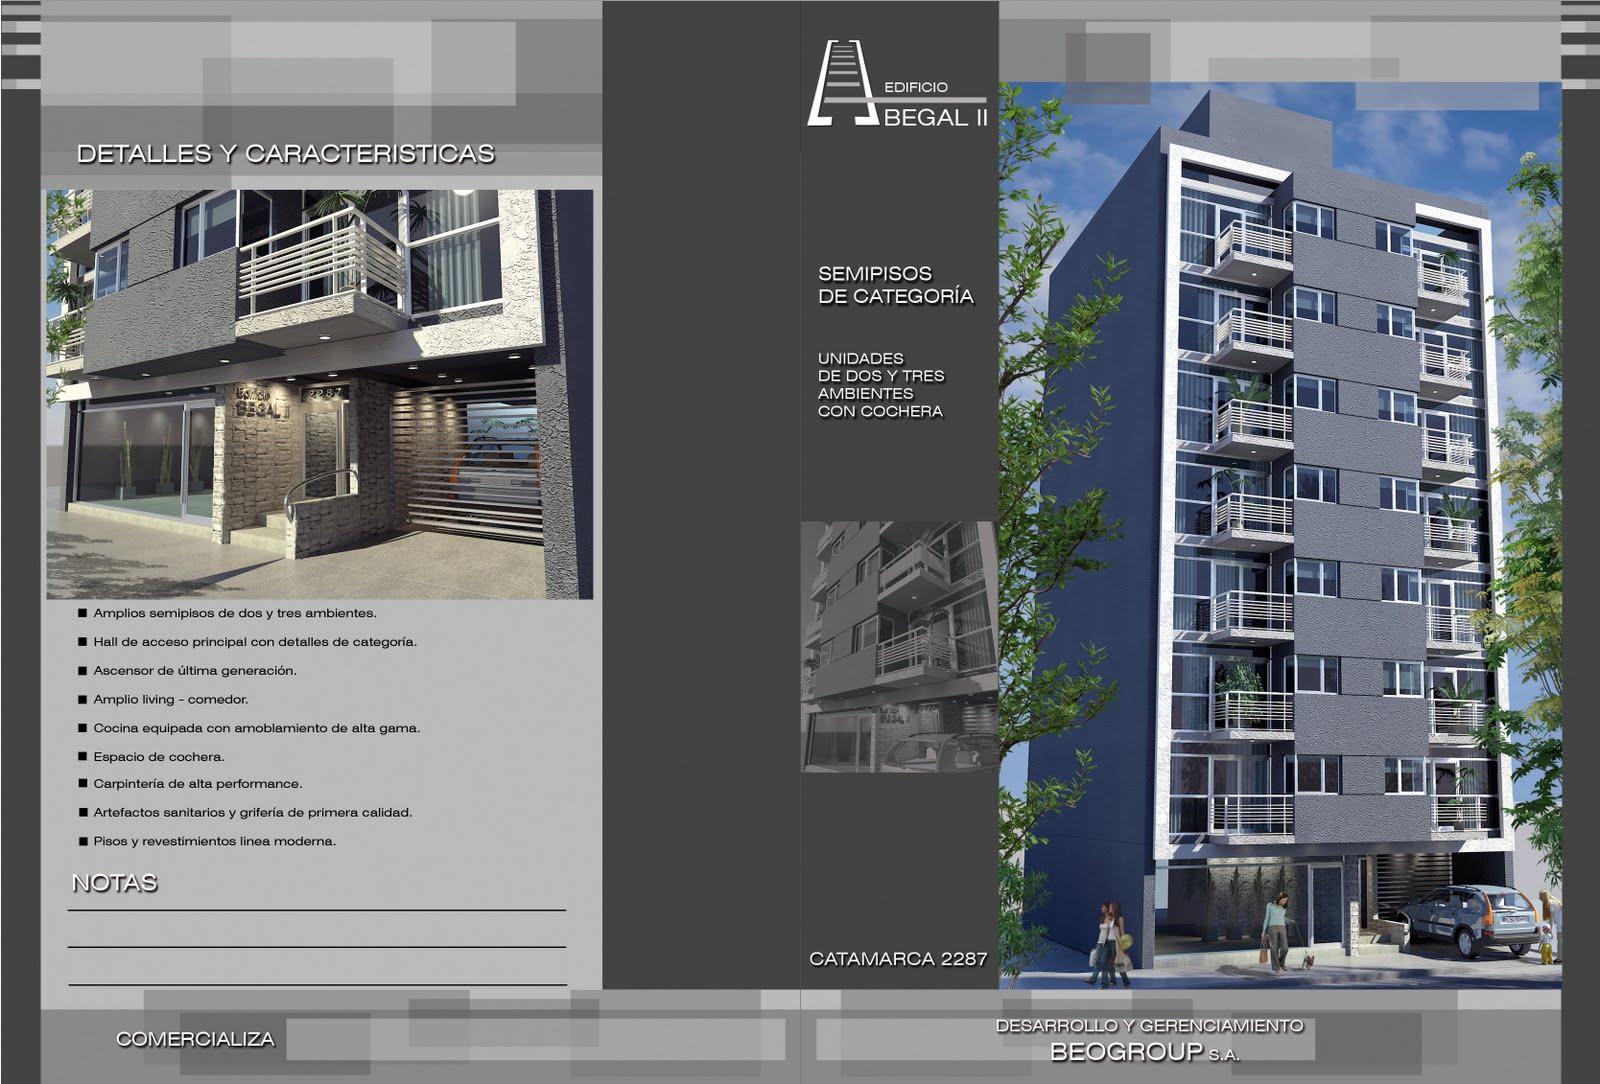 R E N F I S Arquitectura Digital Promoci N Inmobiliaria